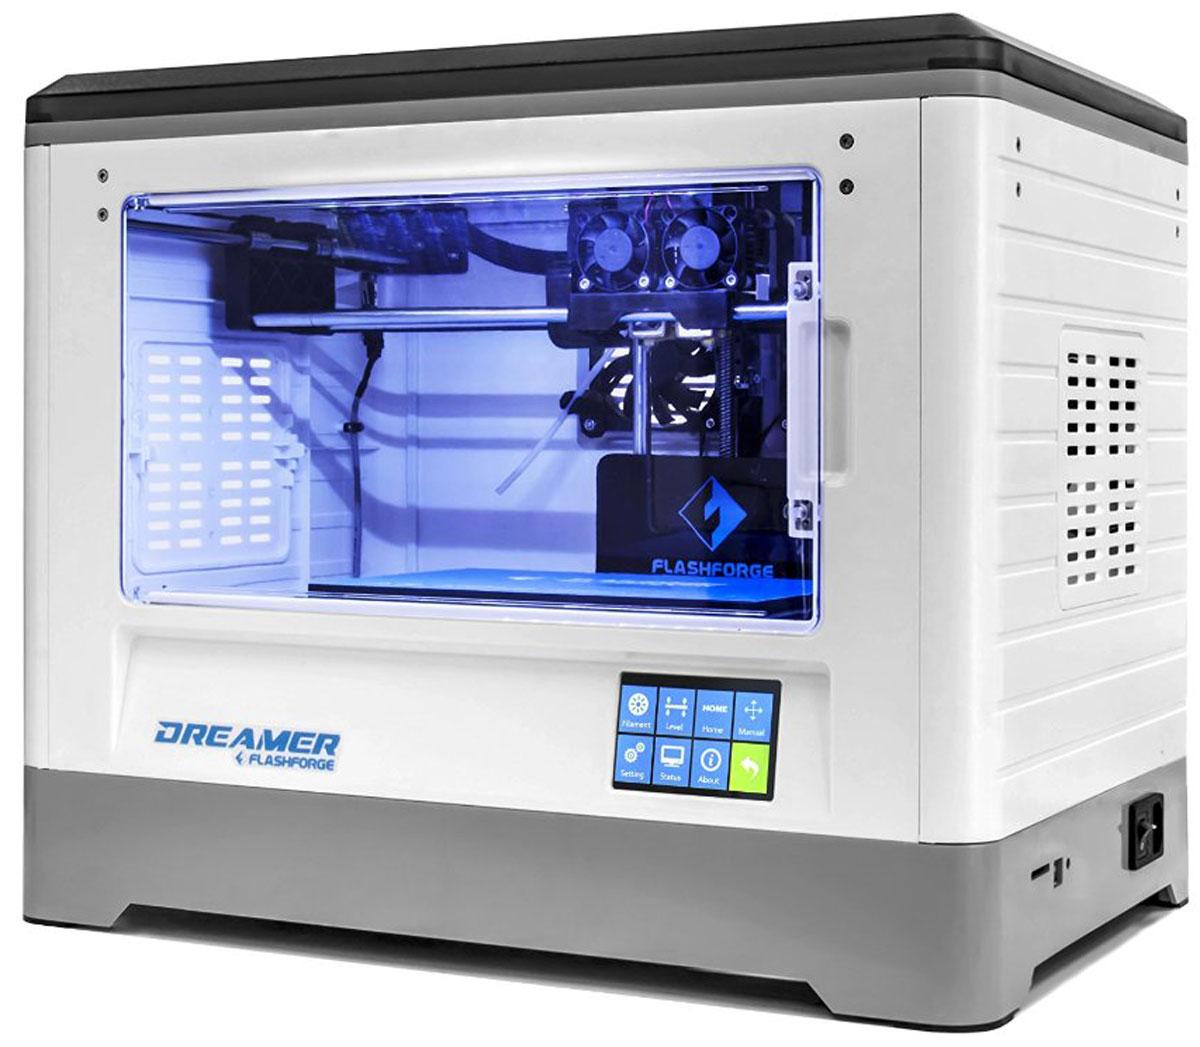 FlashForge Dreamer 3D принтер